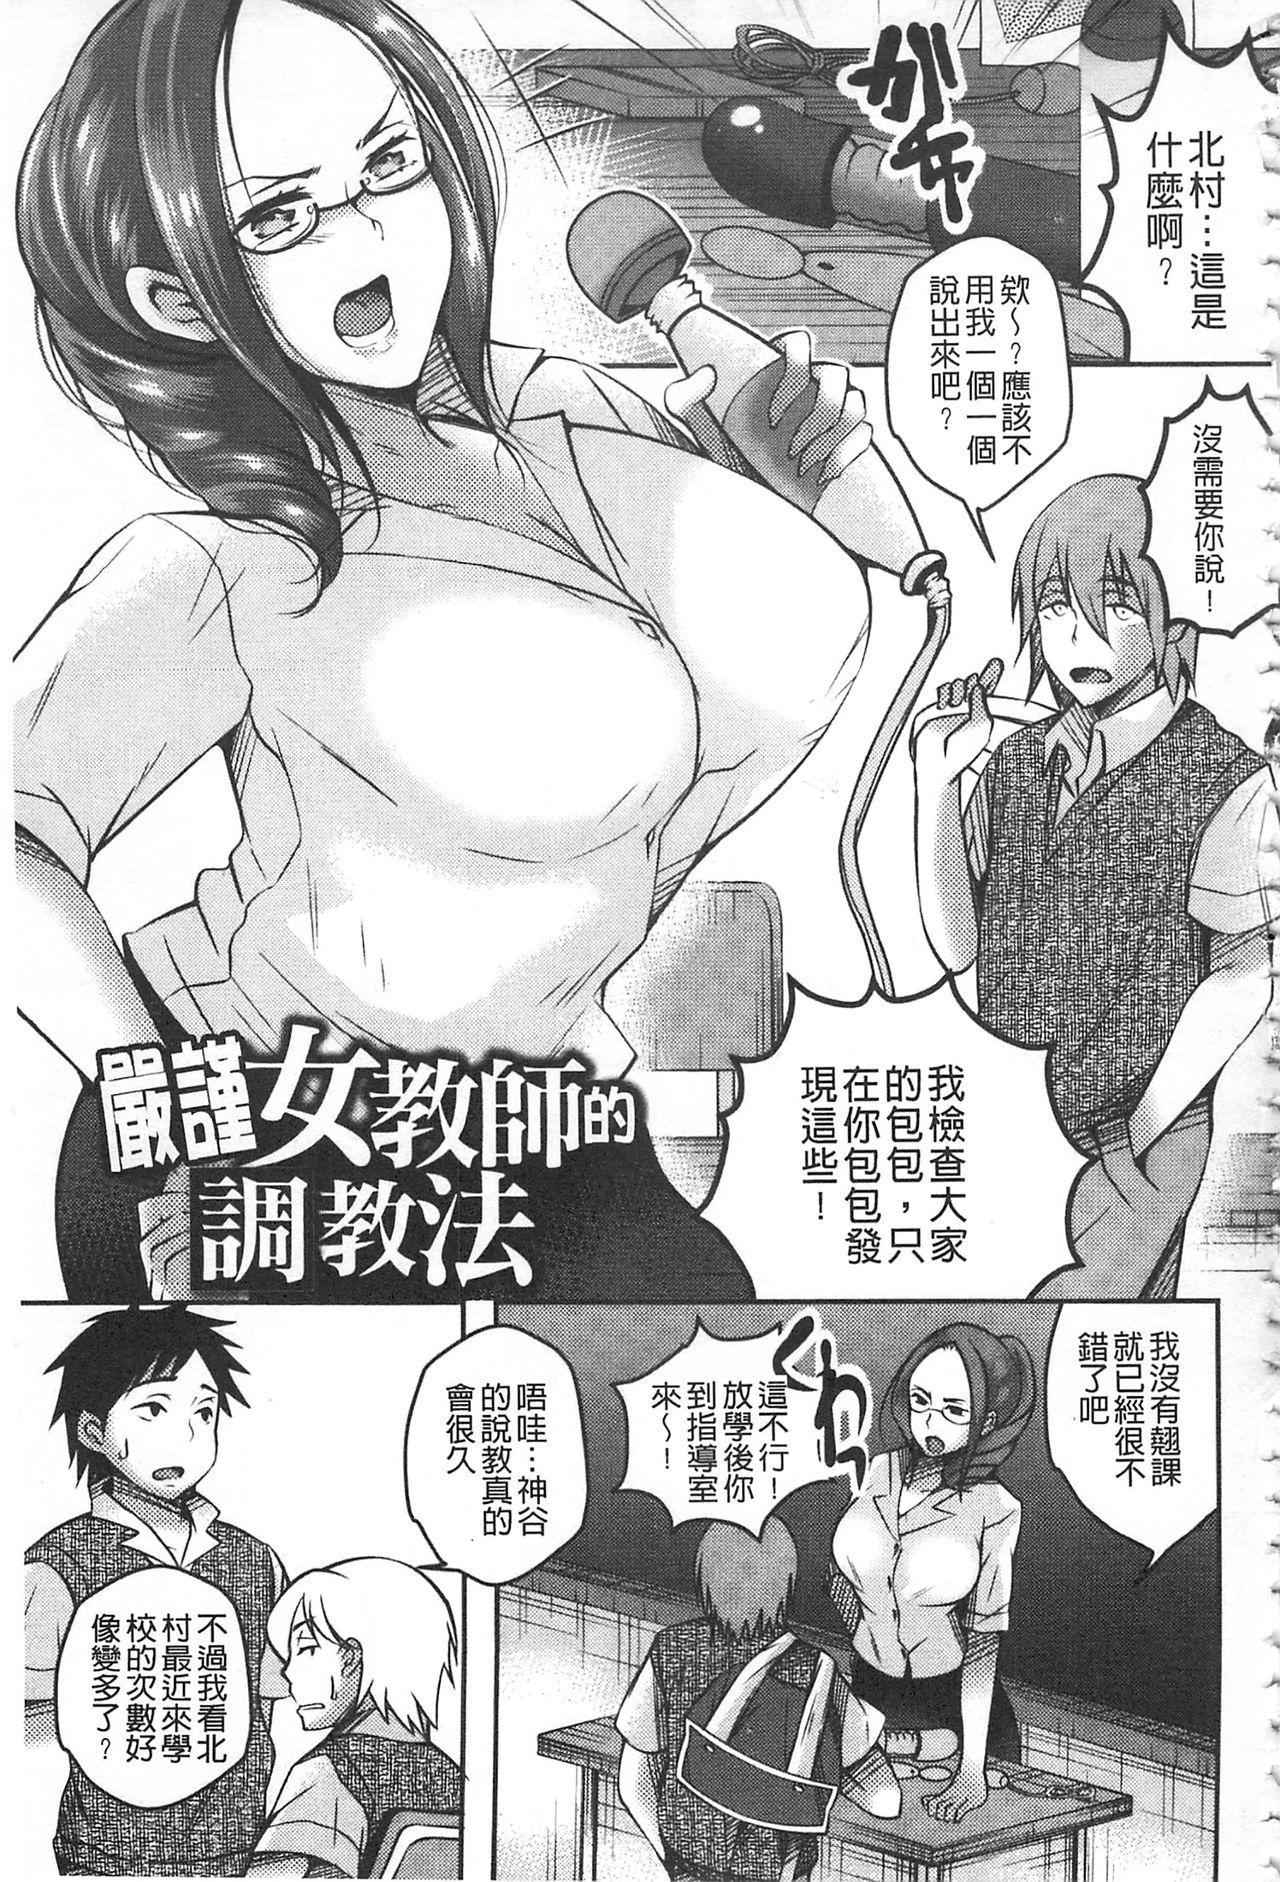 Kanjuku Otome no Odoshikata | 姦熟乙女的脅迫法 120